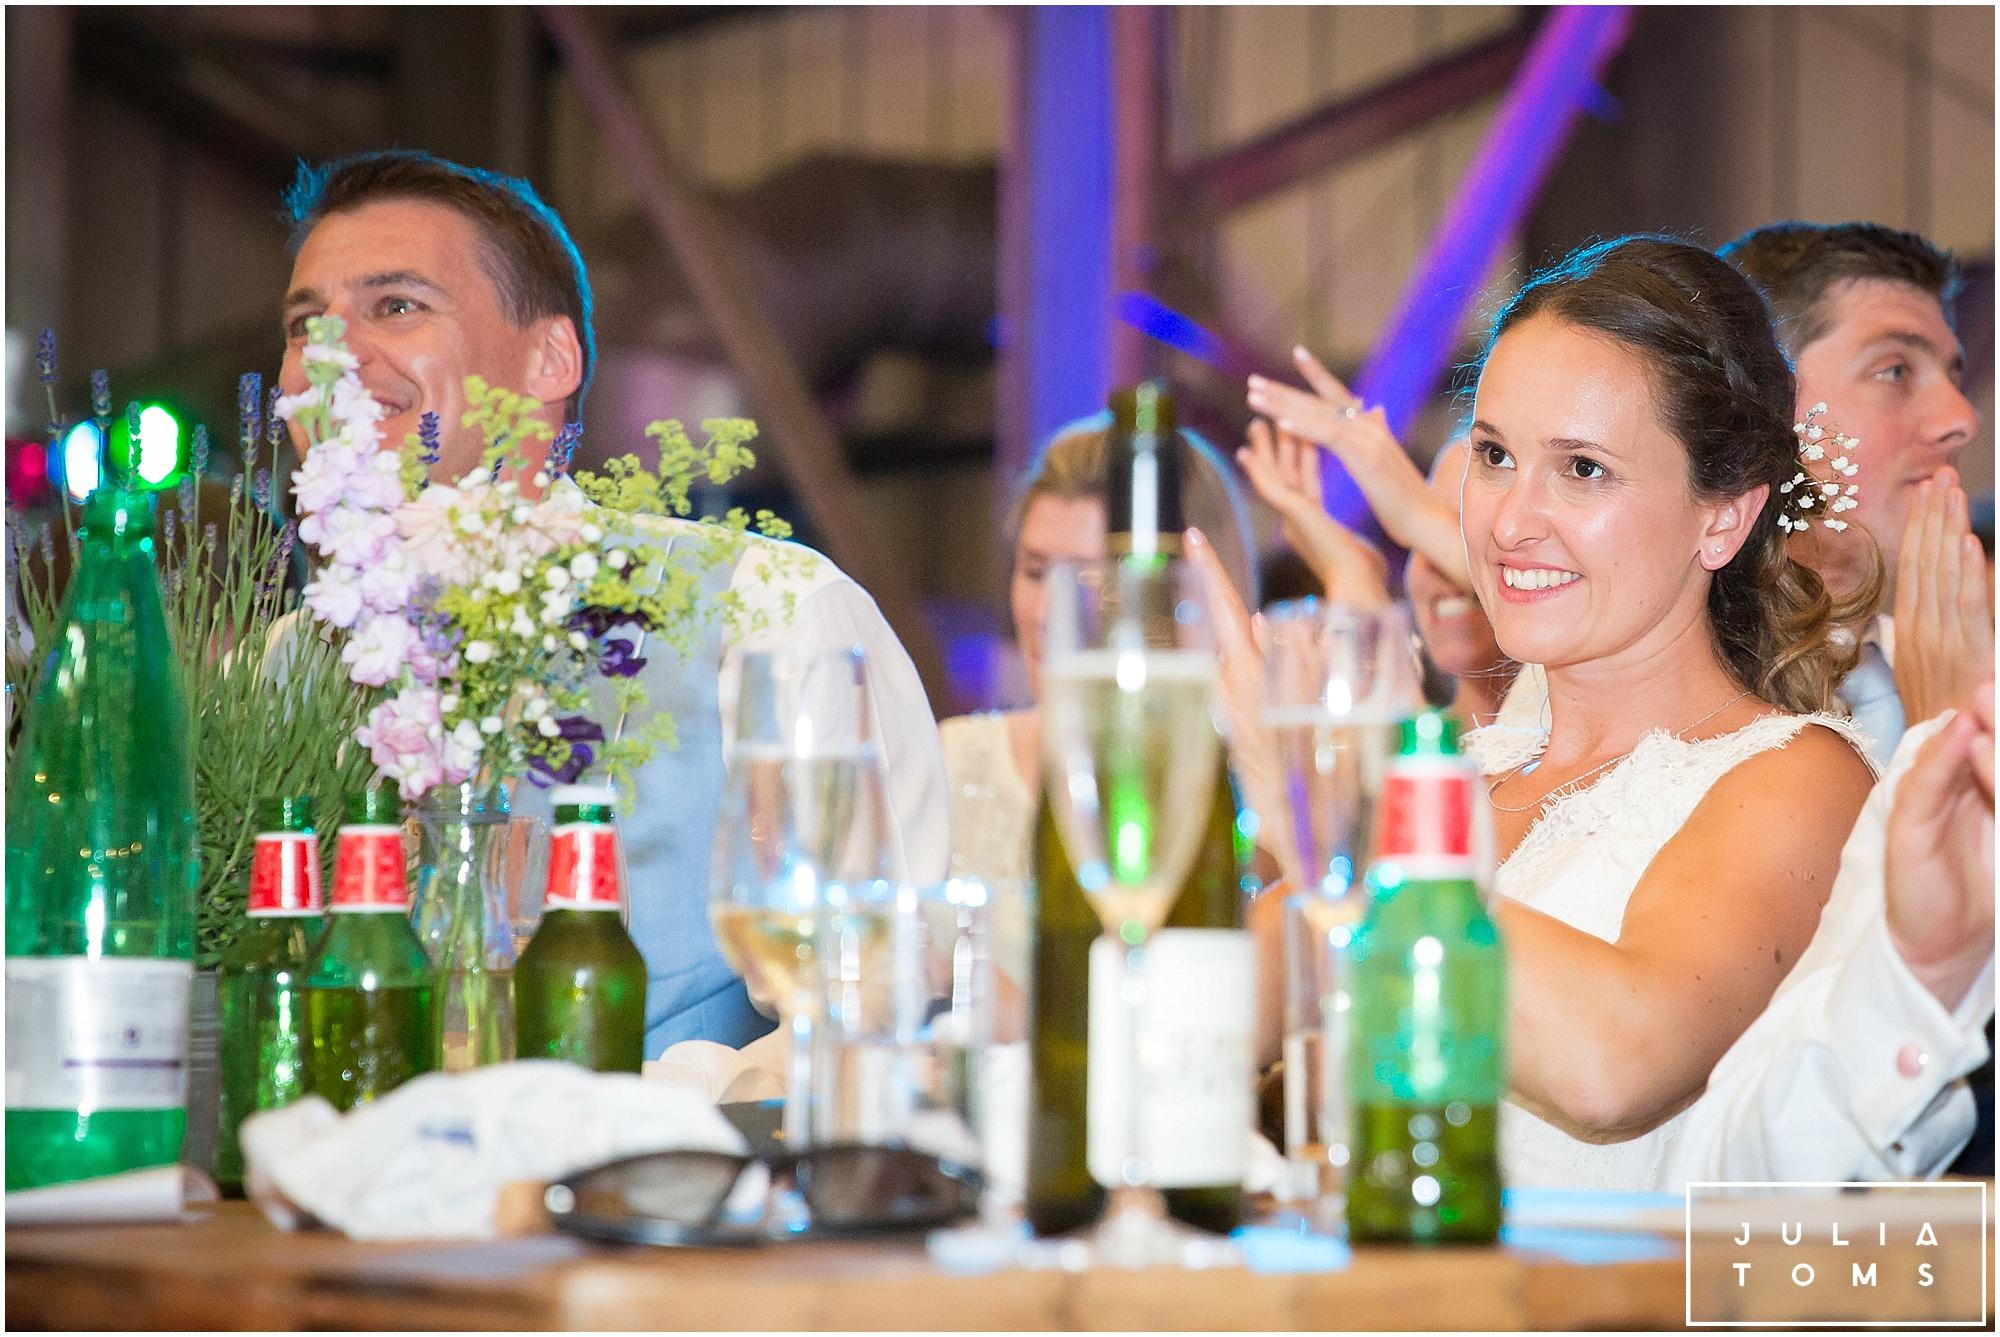 julia_toms_chichester_wedding_photographer_portsmouth_057.jpg